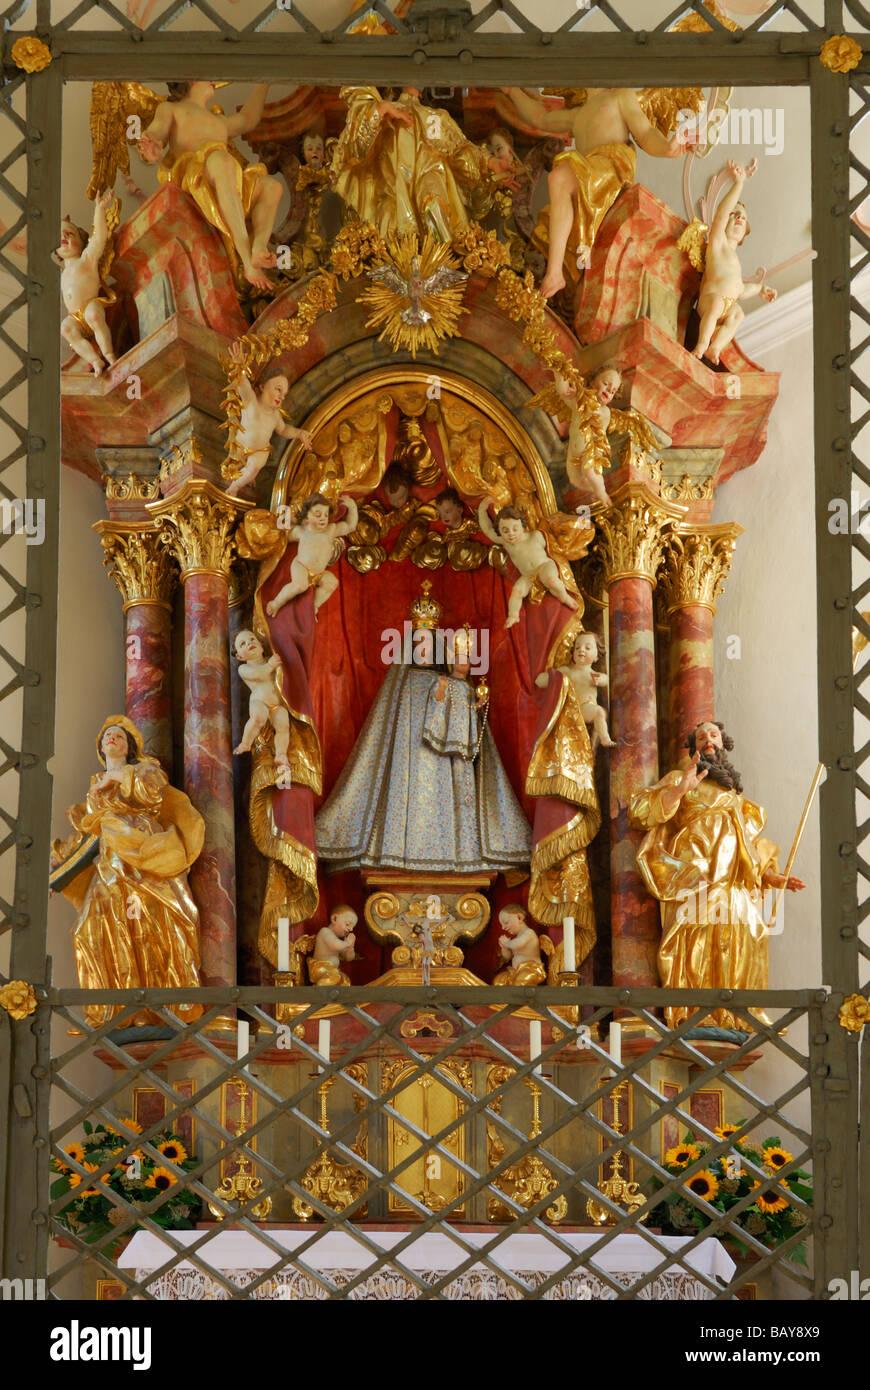 madonna in chapell Lorettokapelle, pilgrimage chapell, interior view, Oberstdorf, Allgaeu range, Allgaeu, Swabia, - Stock Image